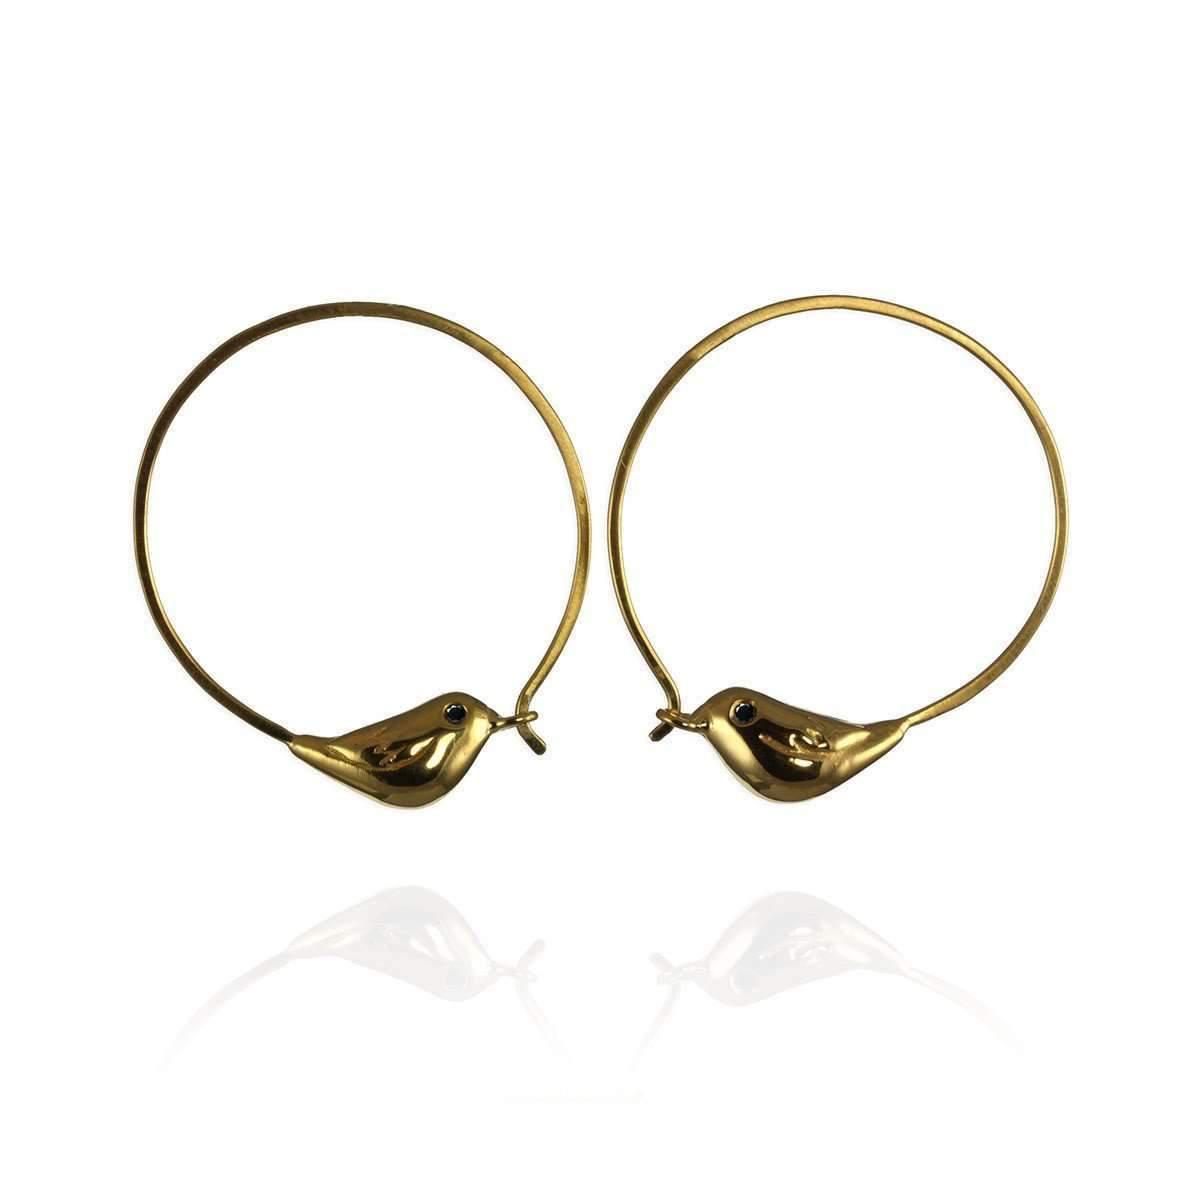 Jana Reinhardt Gold Plated Silver Sparrow Hoop Earrings Jhwy61rp